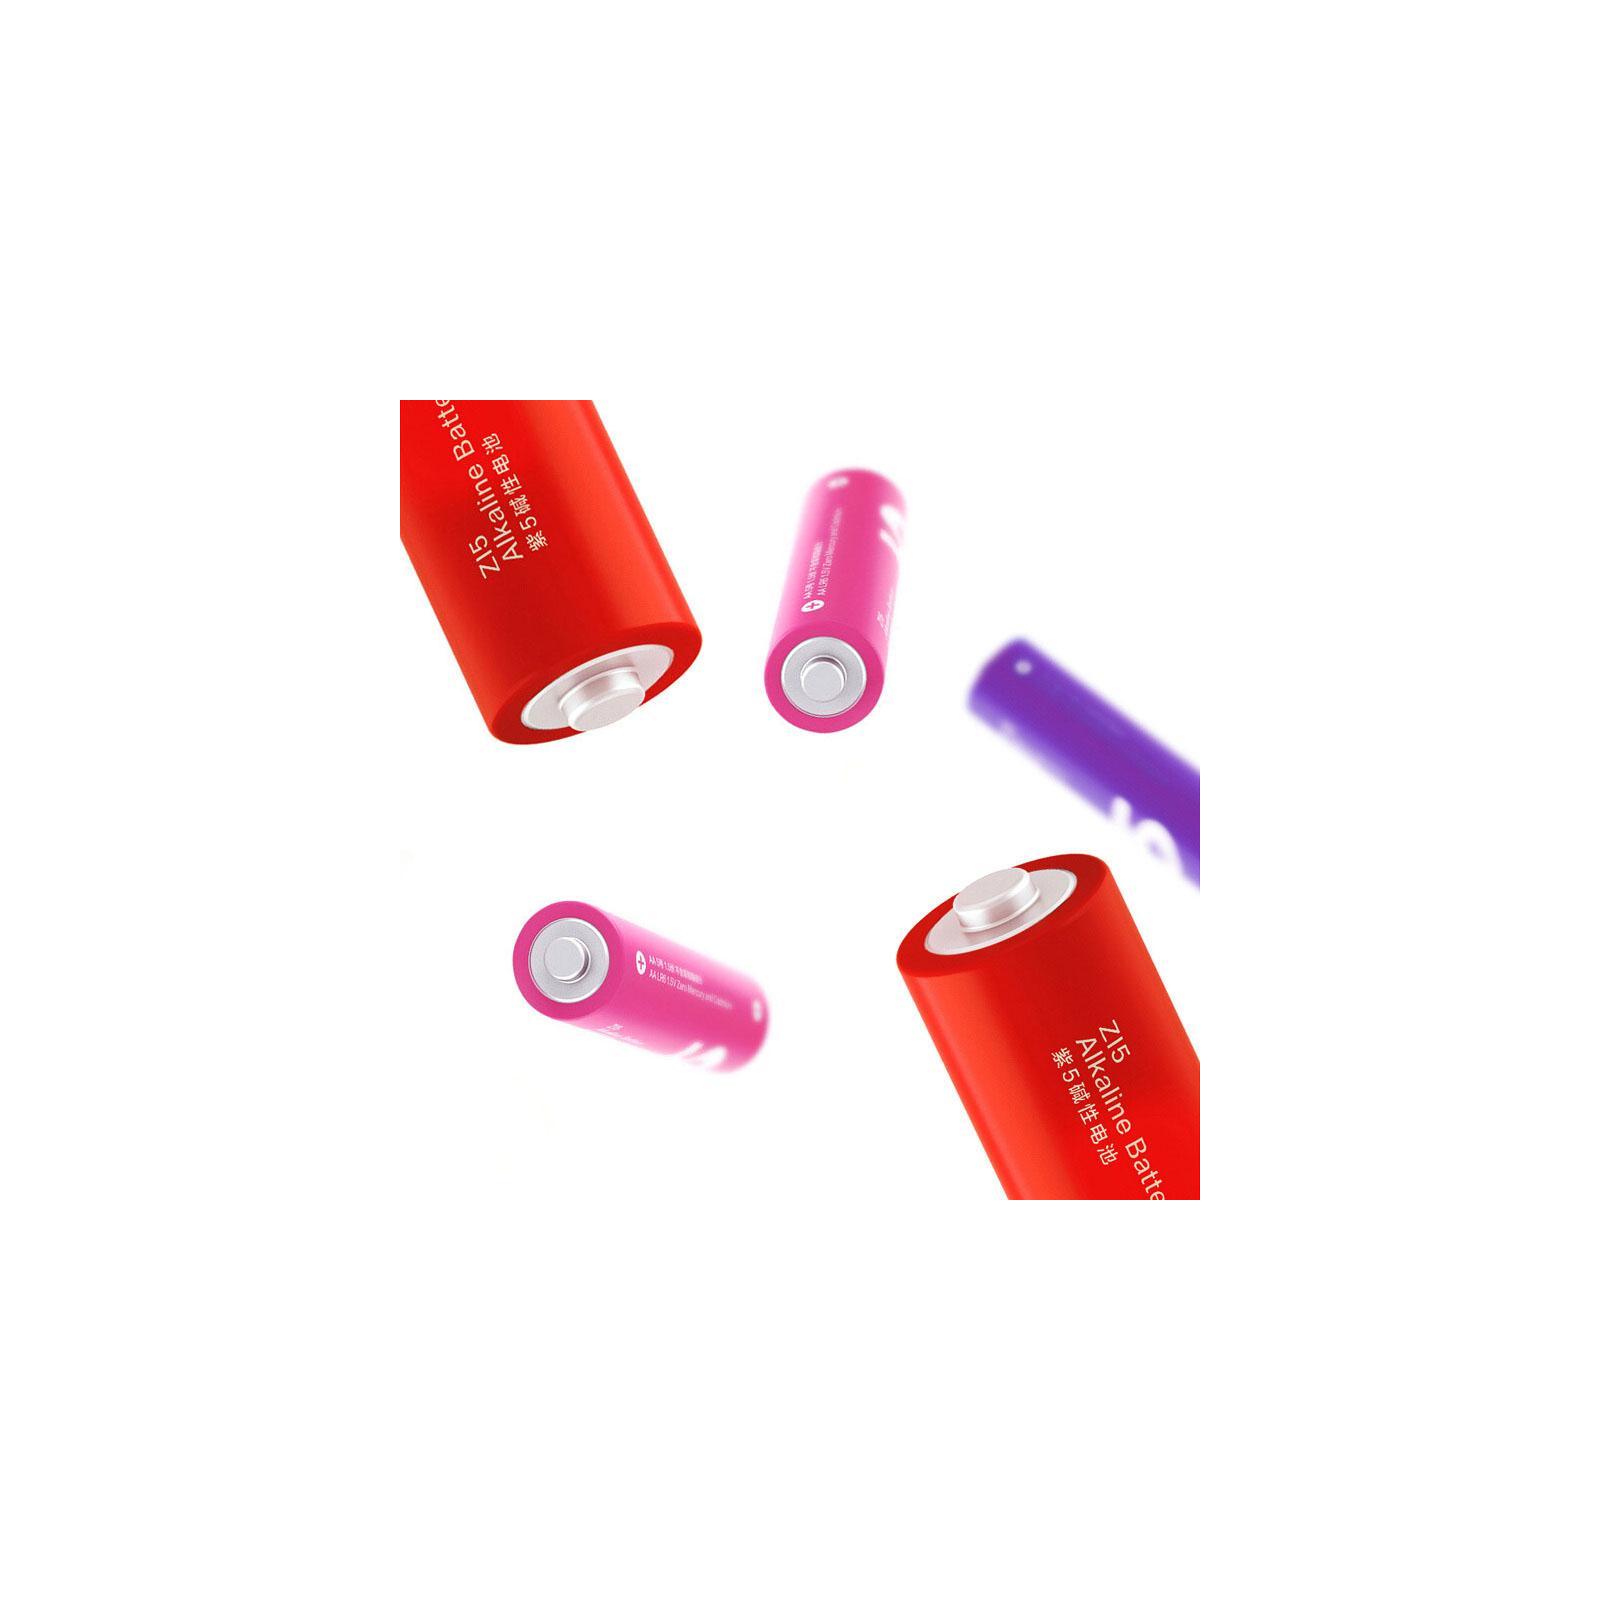 Батарейка ZMI ZI7 Rainbow AAA batteries * 40 (Ф01153) изображение 4